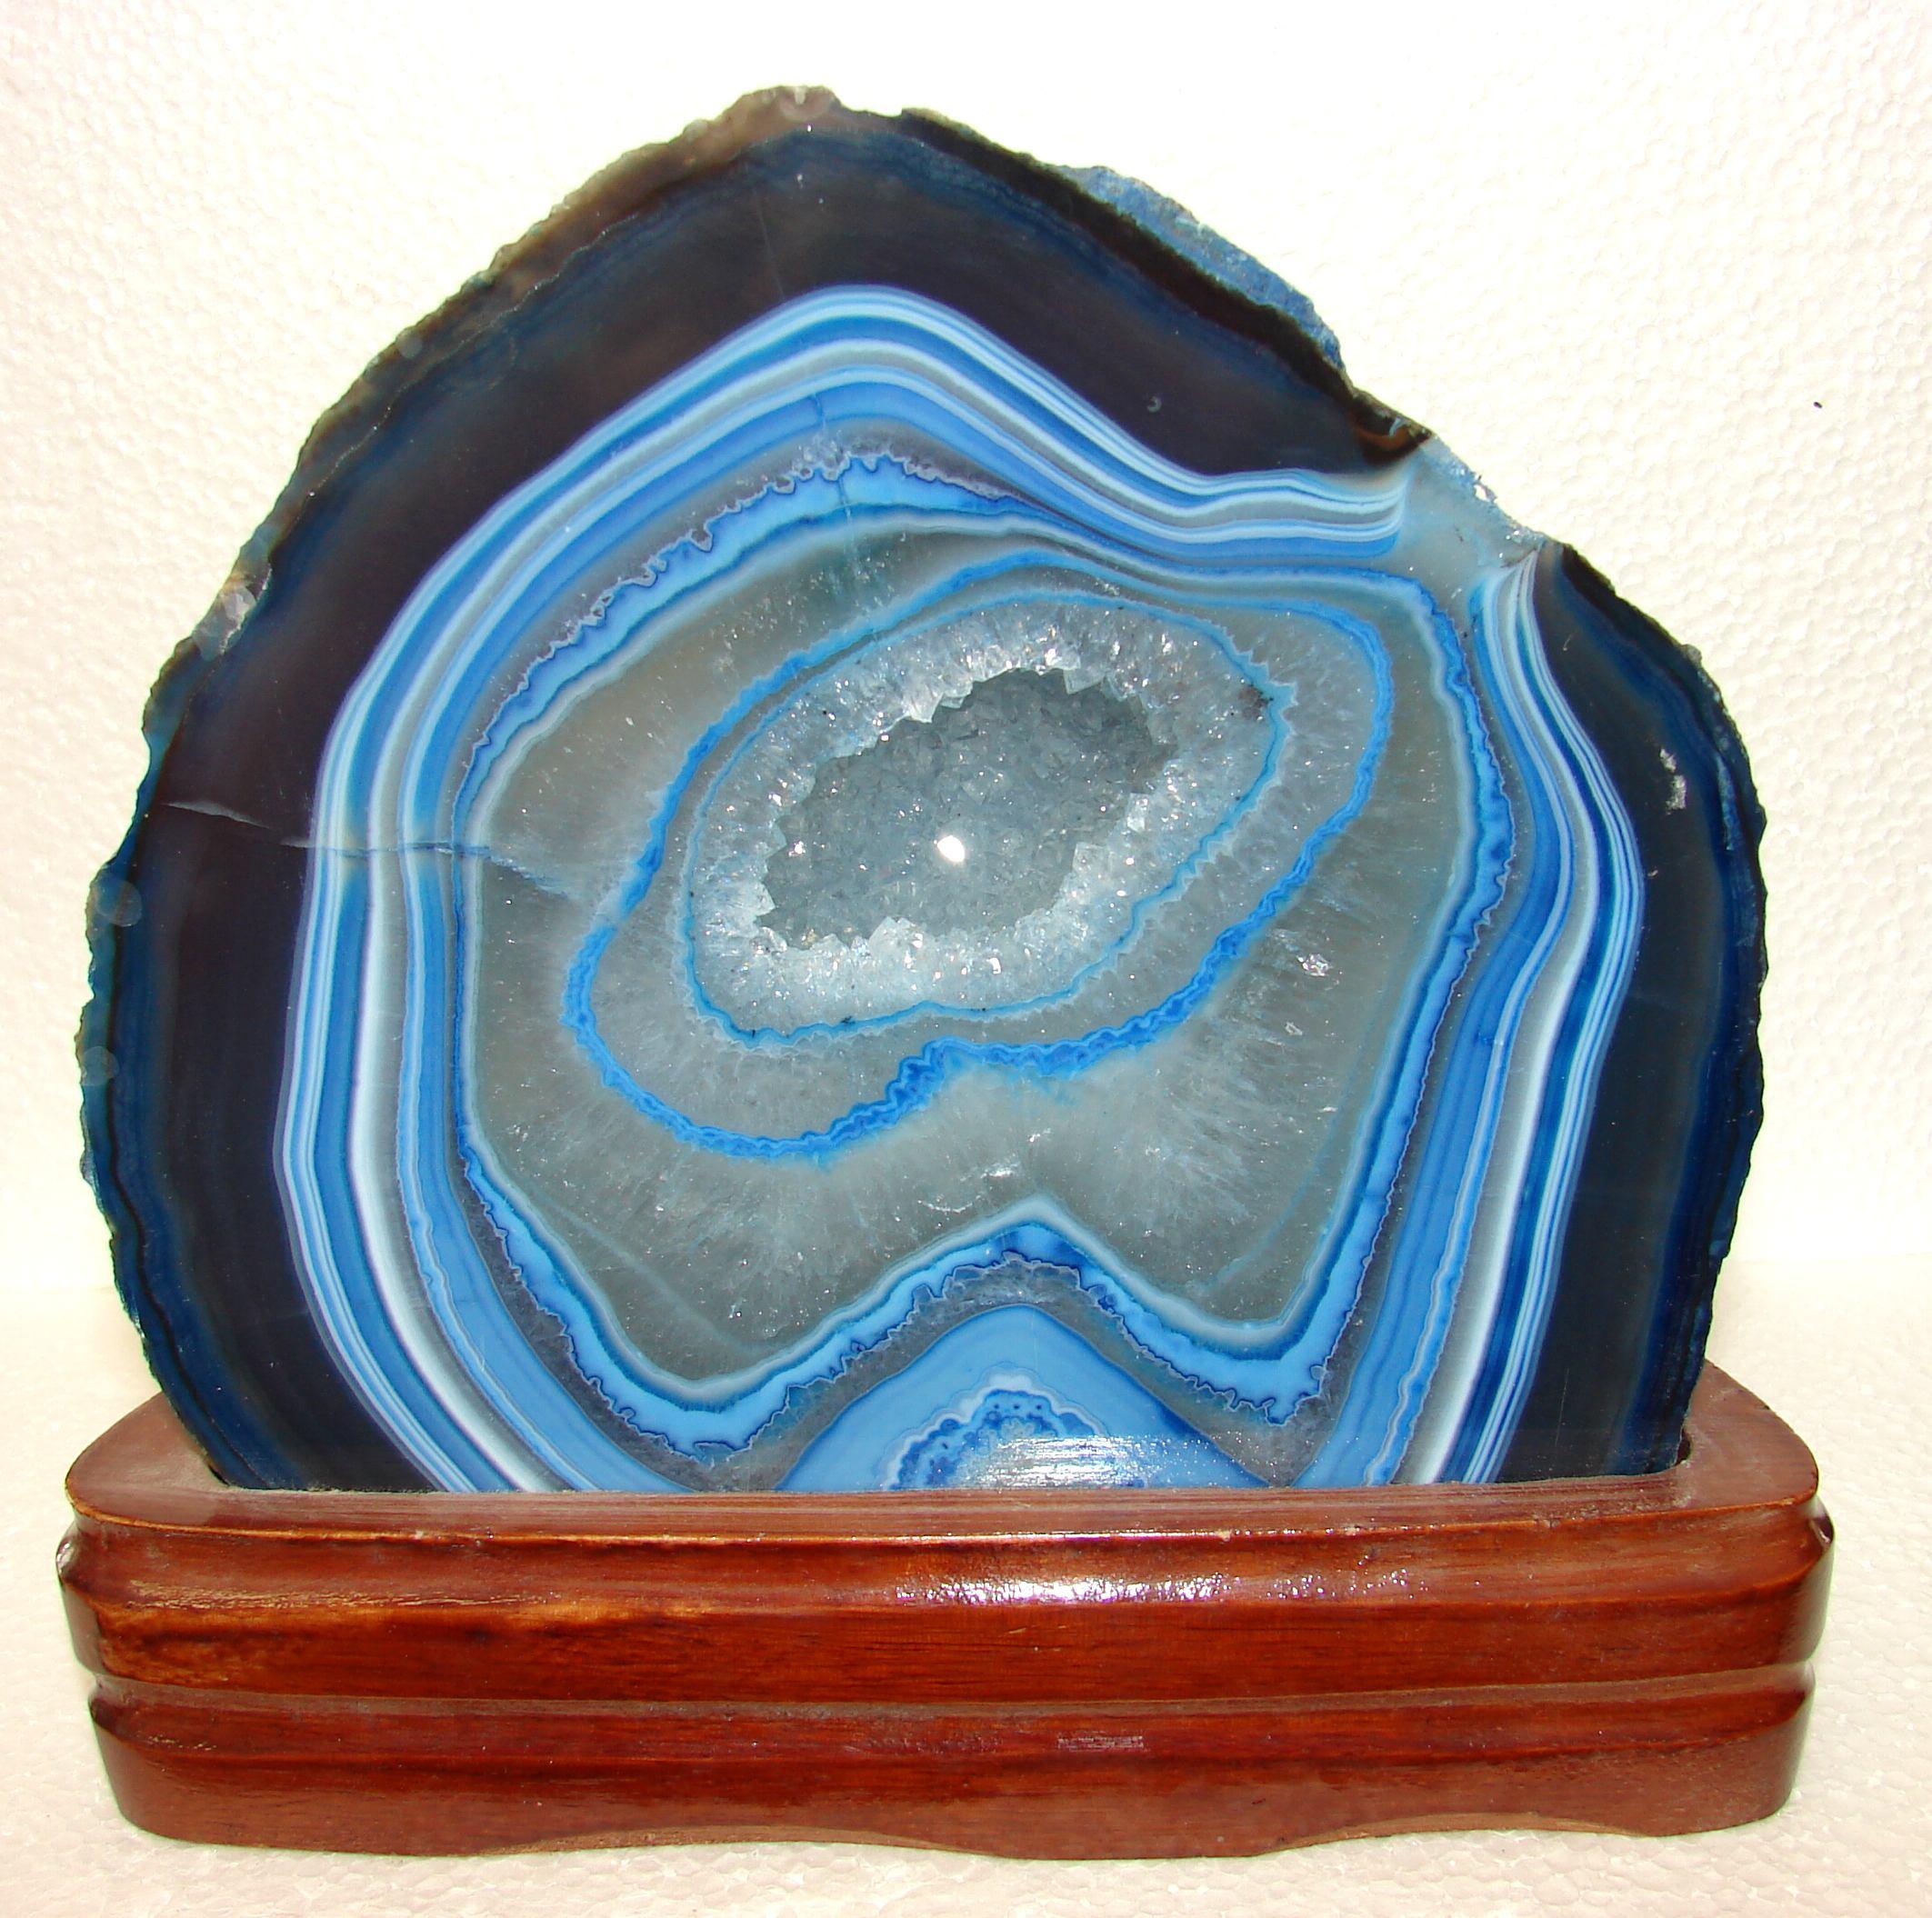 http://www.artfromgod.com/woodaggeode-11.jpg (582341 bytes)